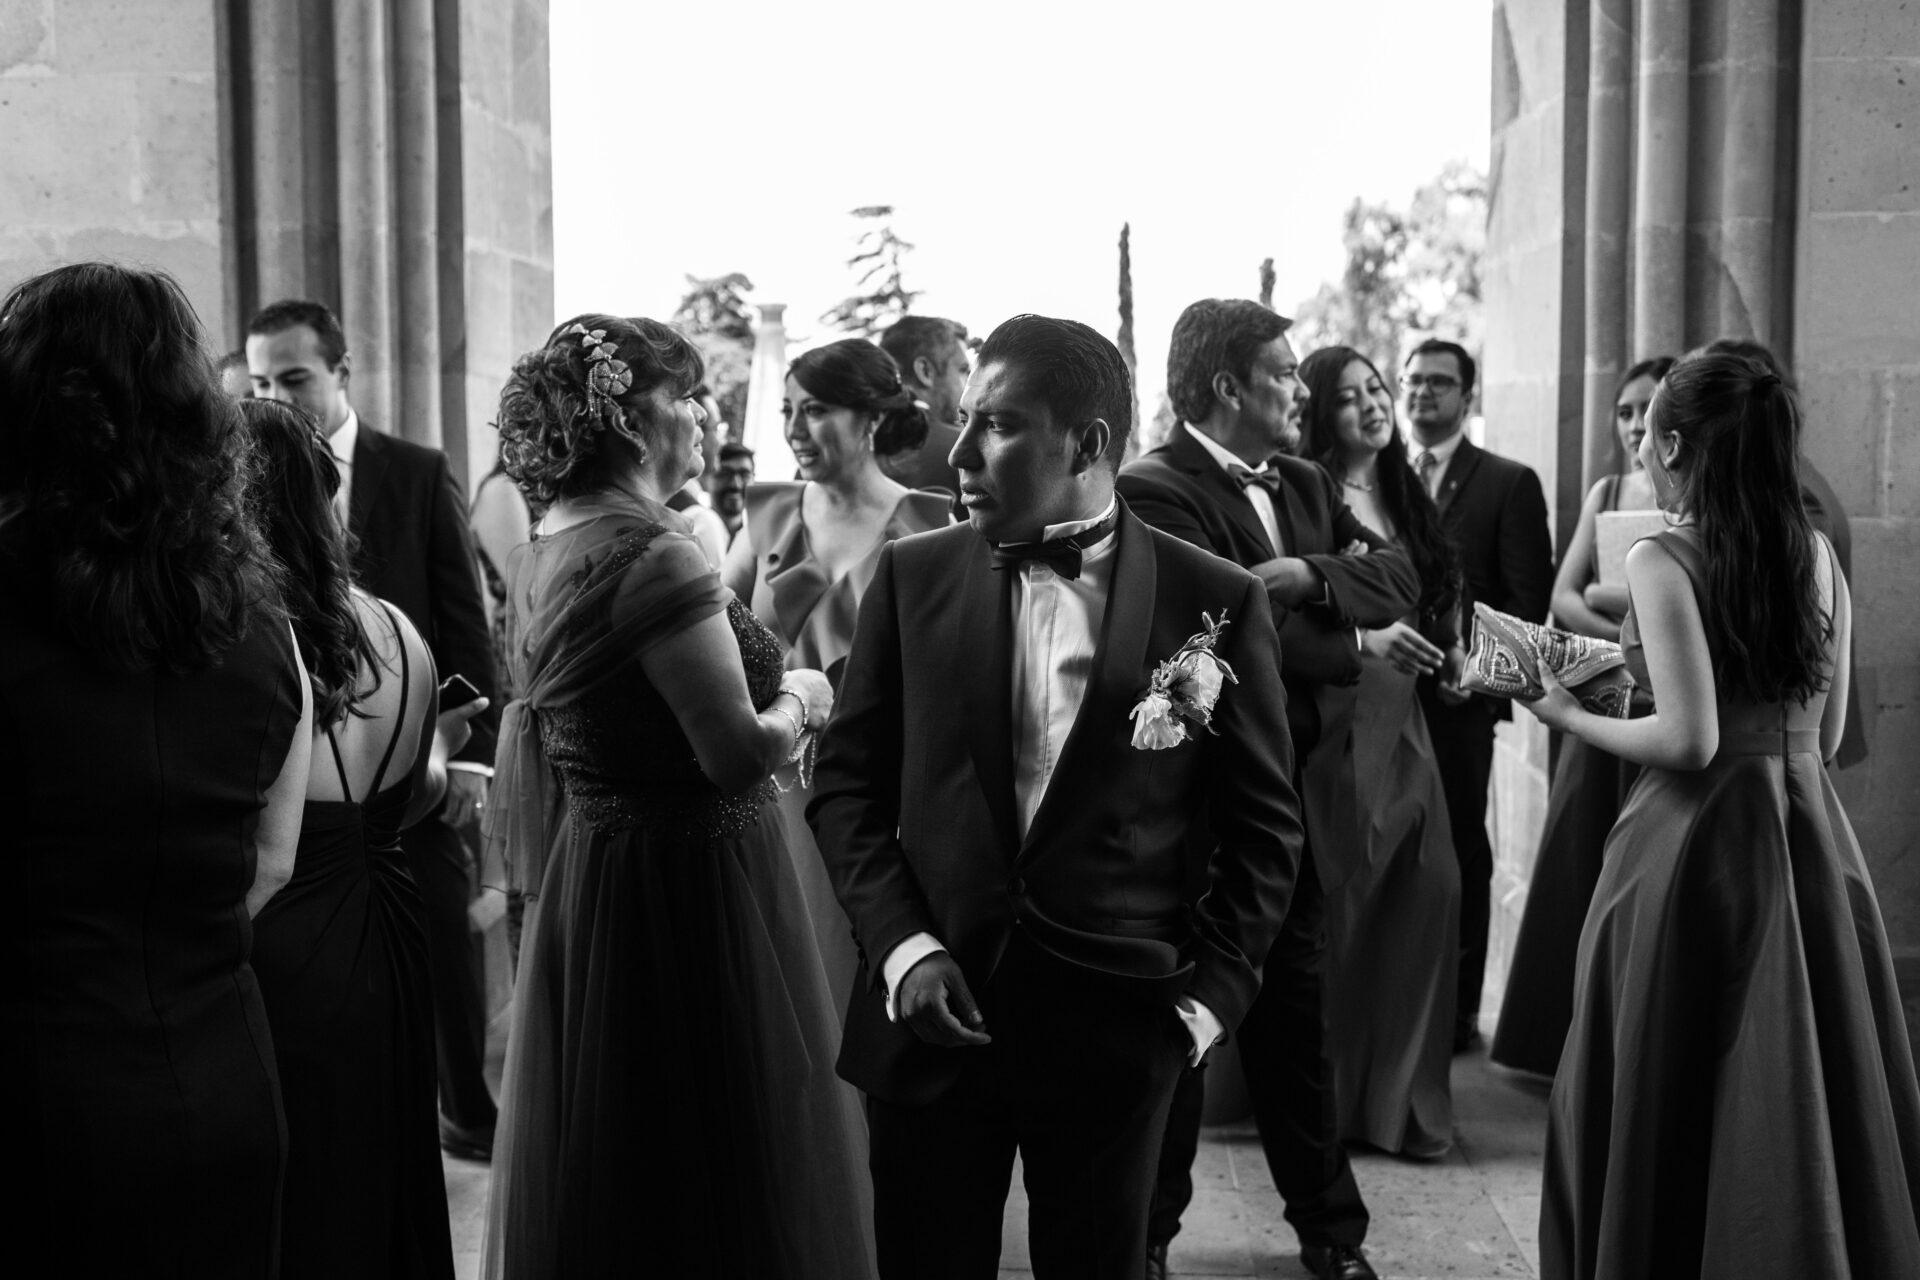 javier_noriega_fotografo_bodas_exhacienda_las_mercedes_zacatecas_wedding_photographer1a